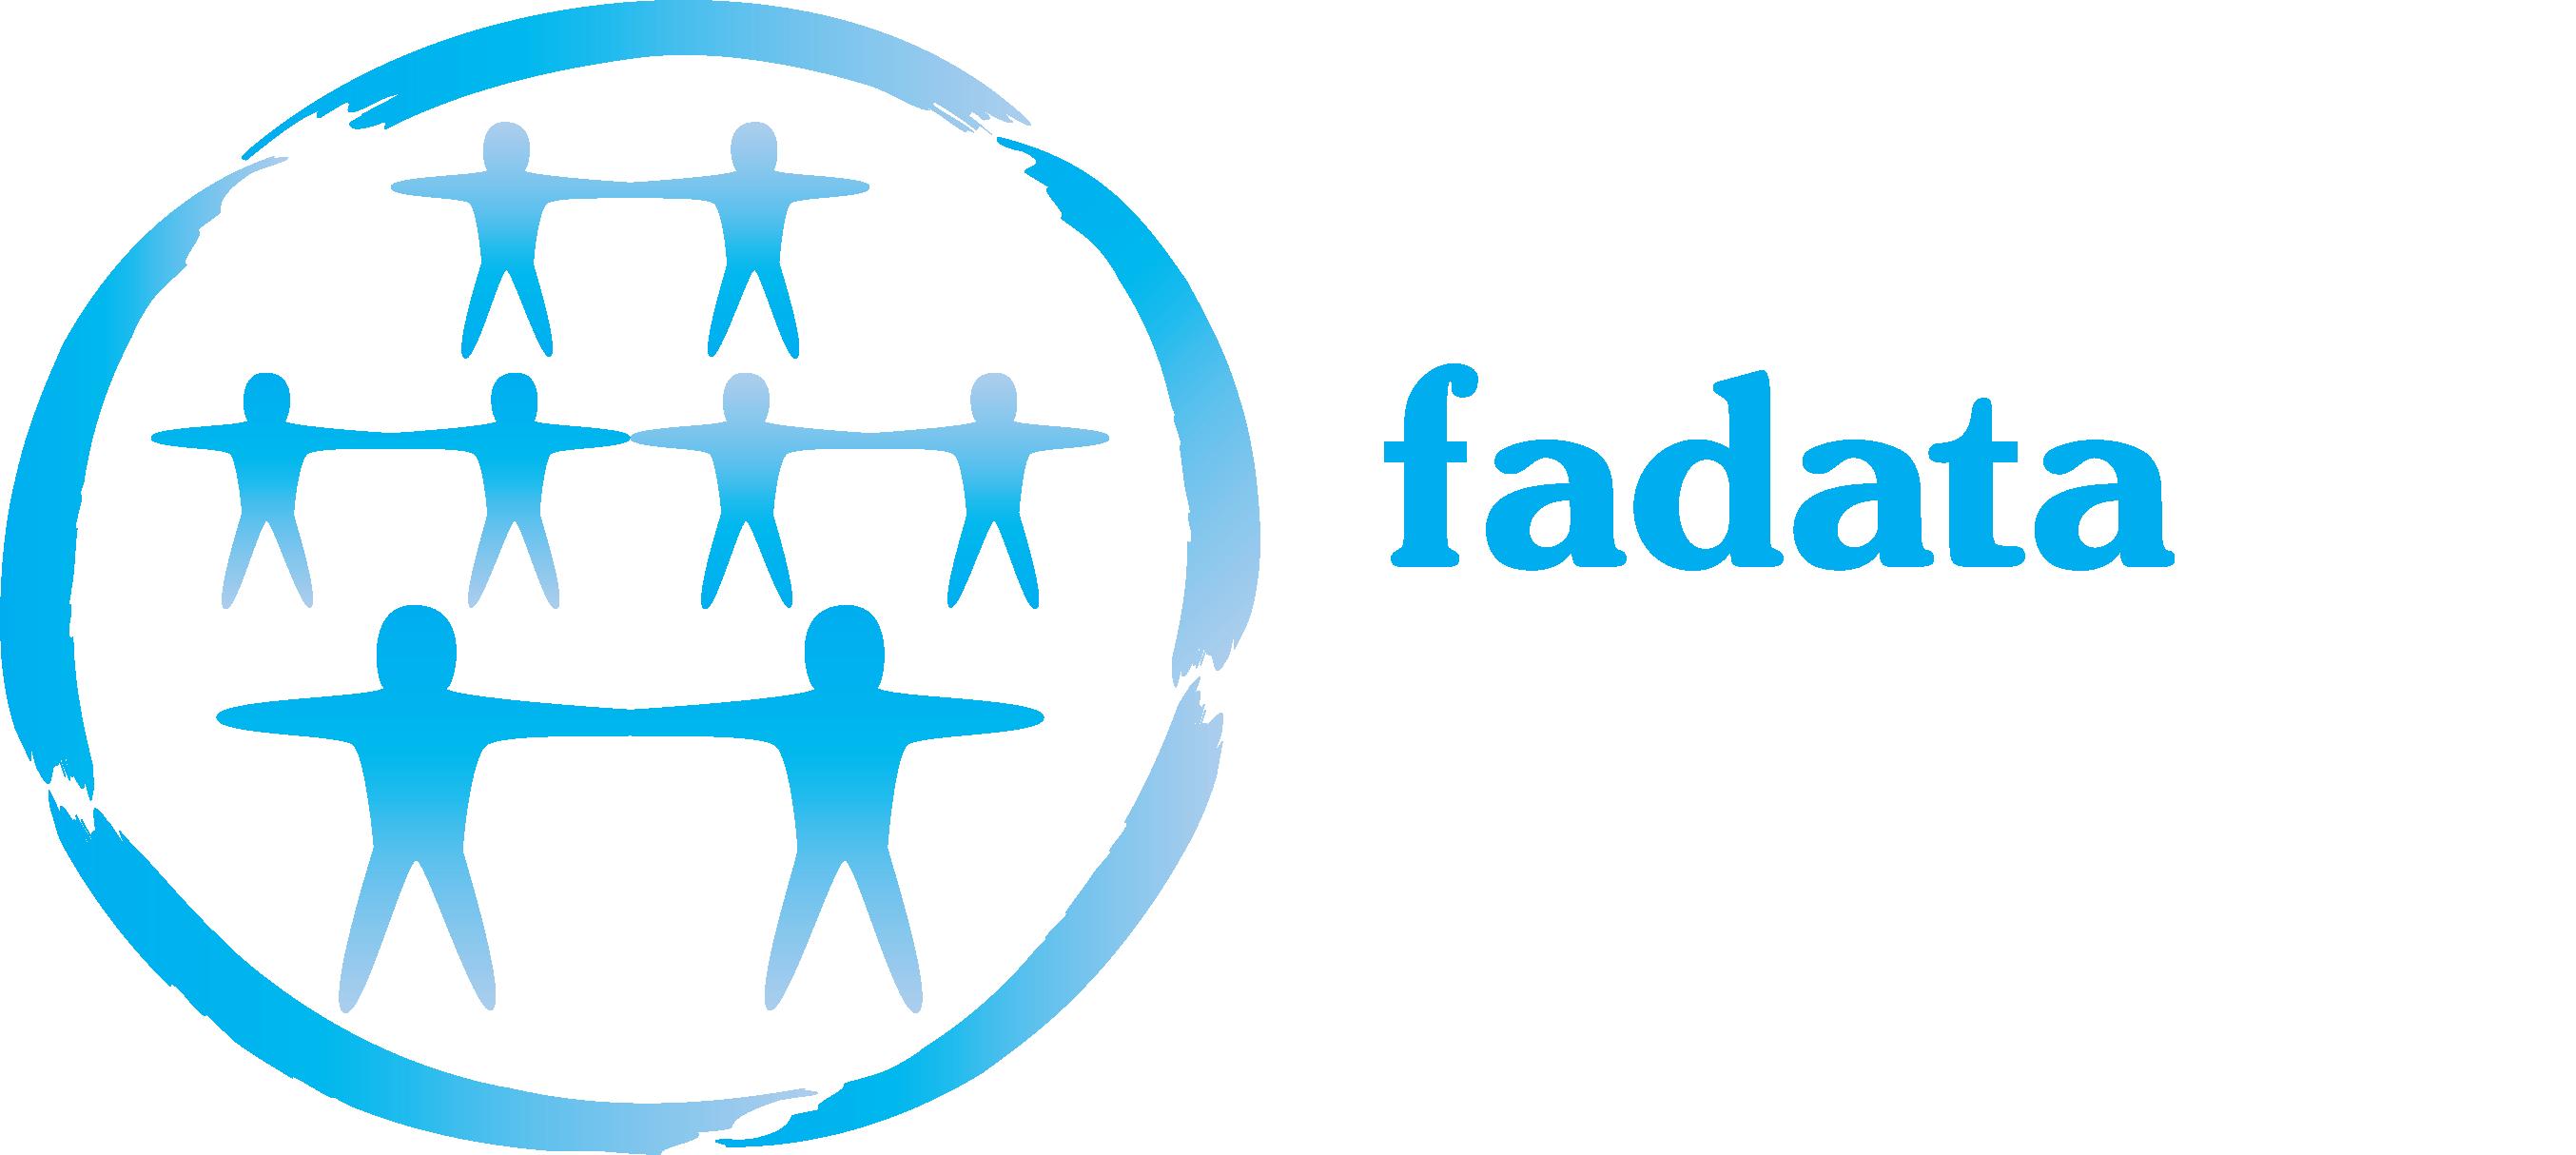 logo_Fadata_12th_forum_lp